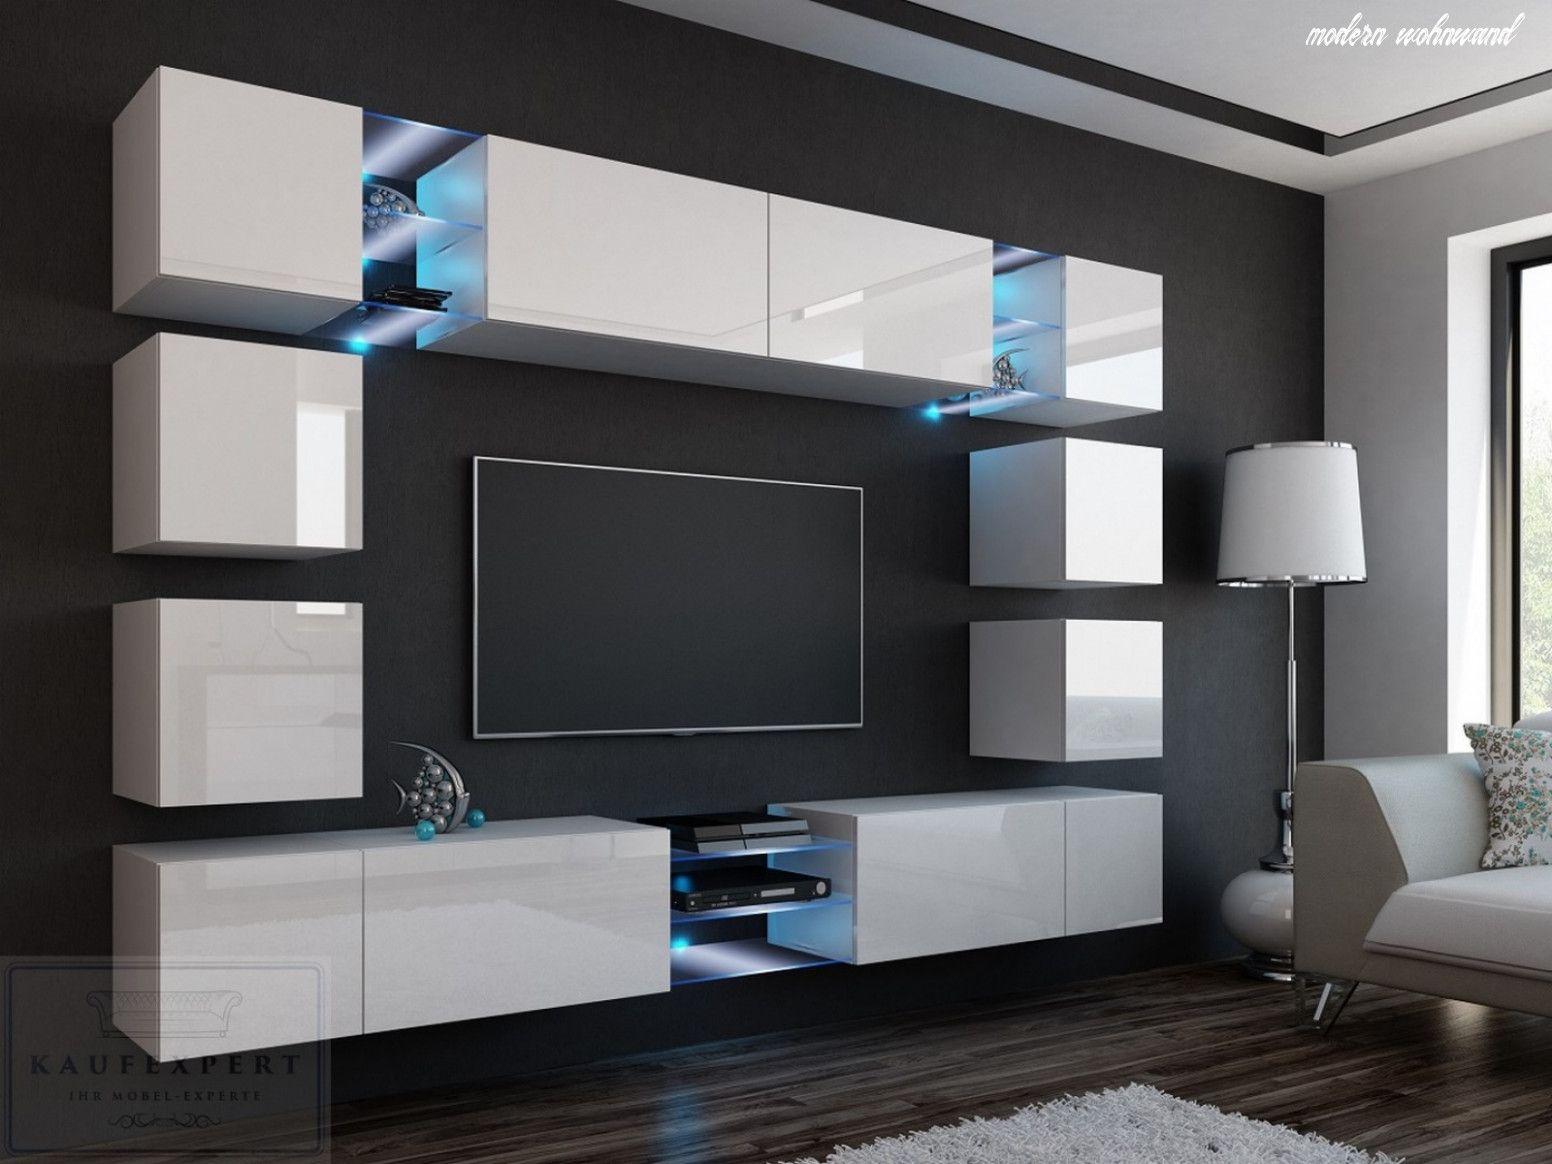 5 Haufige Missverstandnisse Uber Das Moderne Wohnwand In 2020 Living Room Wall Units Modern Living Room Wall Living Room Tv Unit Designs